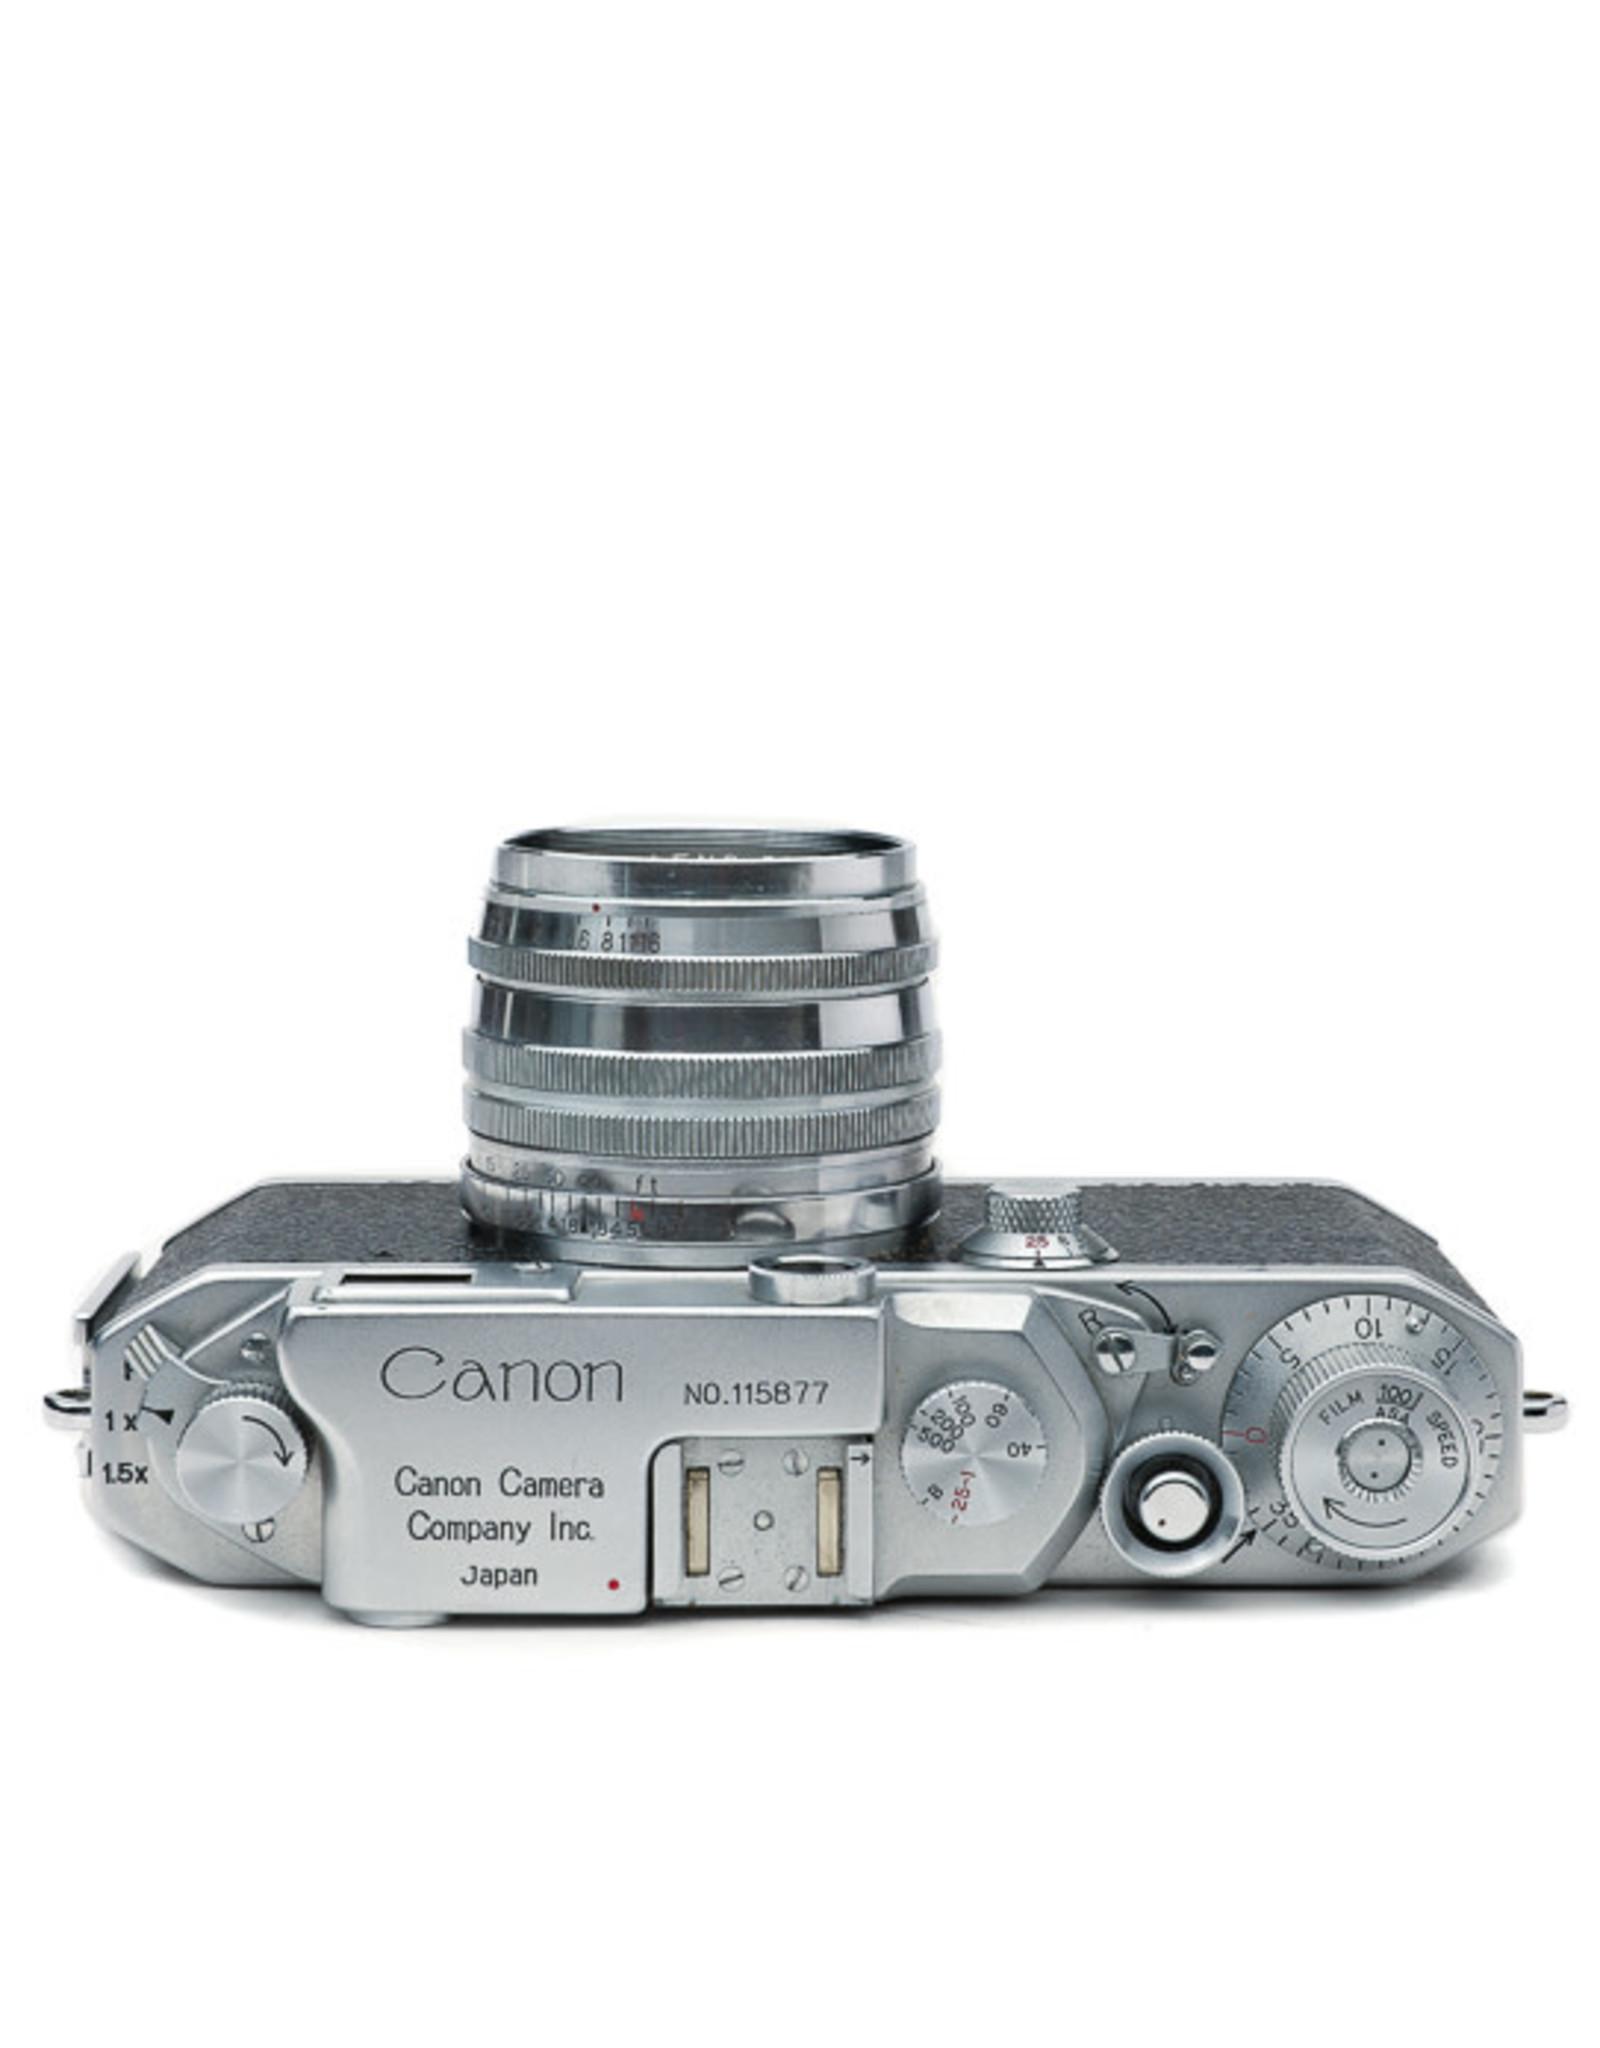 Canon Canon Model IIF 35mm Rangefinder Camera w/50mm f1.8 lens